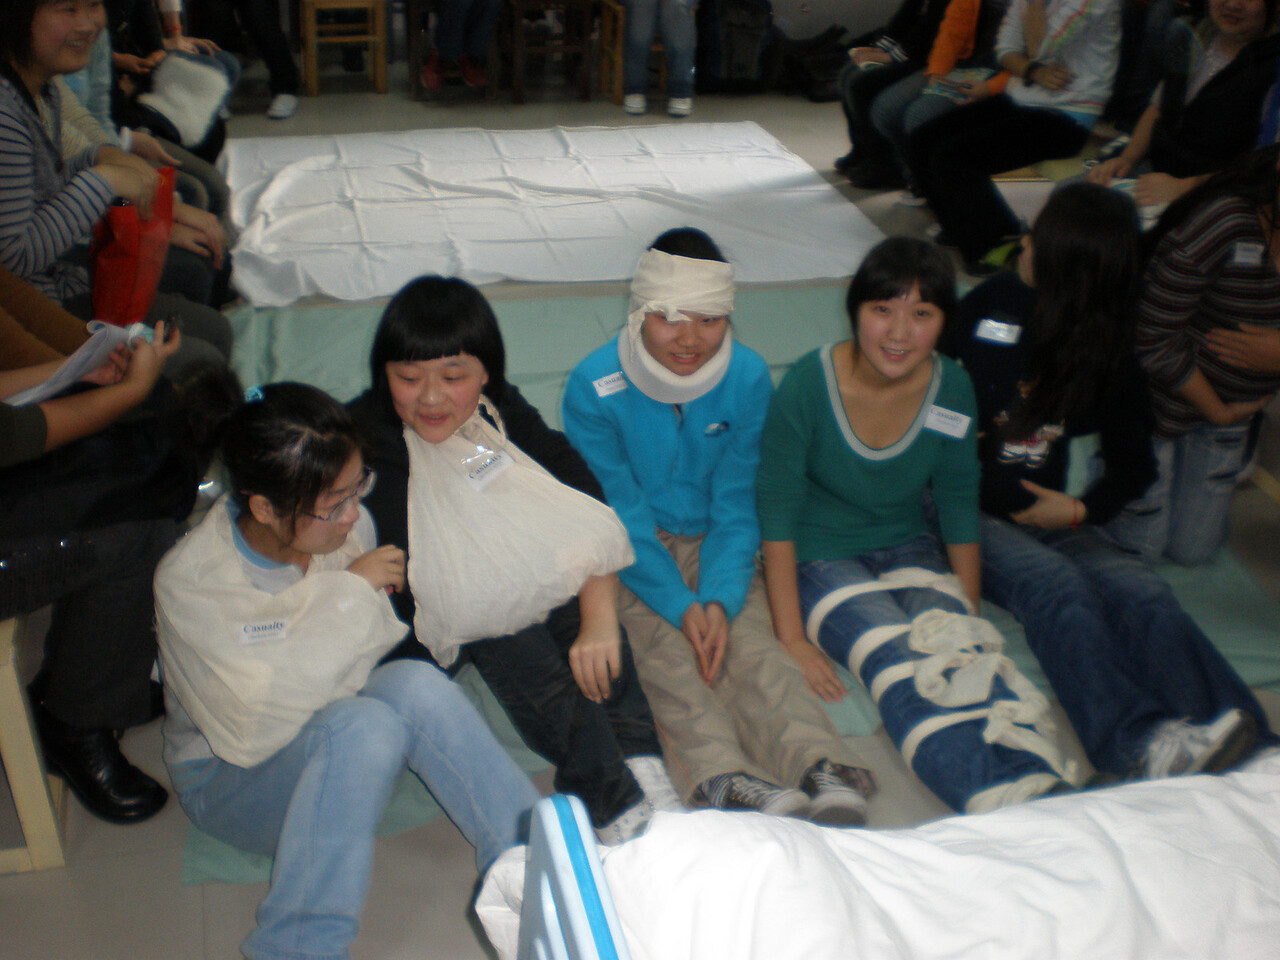 20081013_116 Nursing school disaster management training. So many casualties...